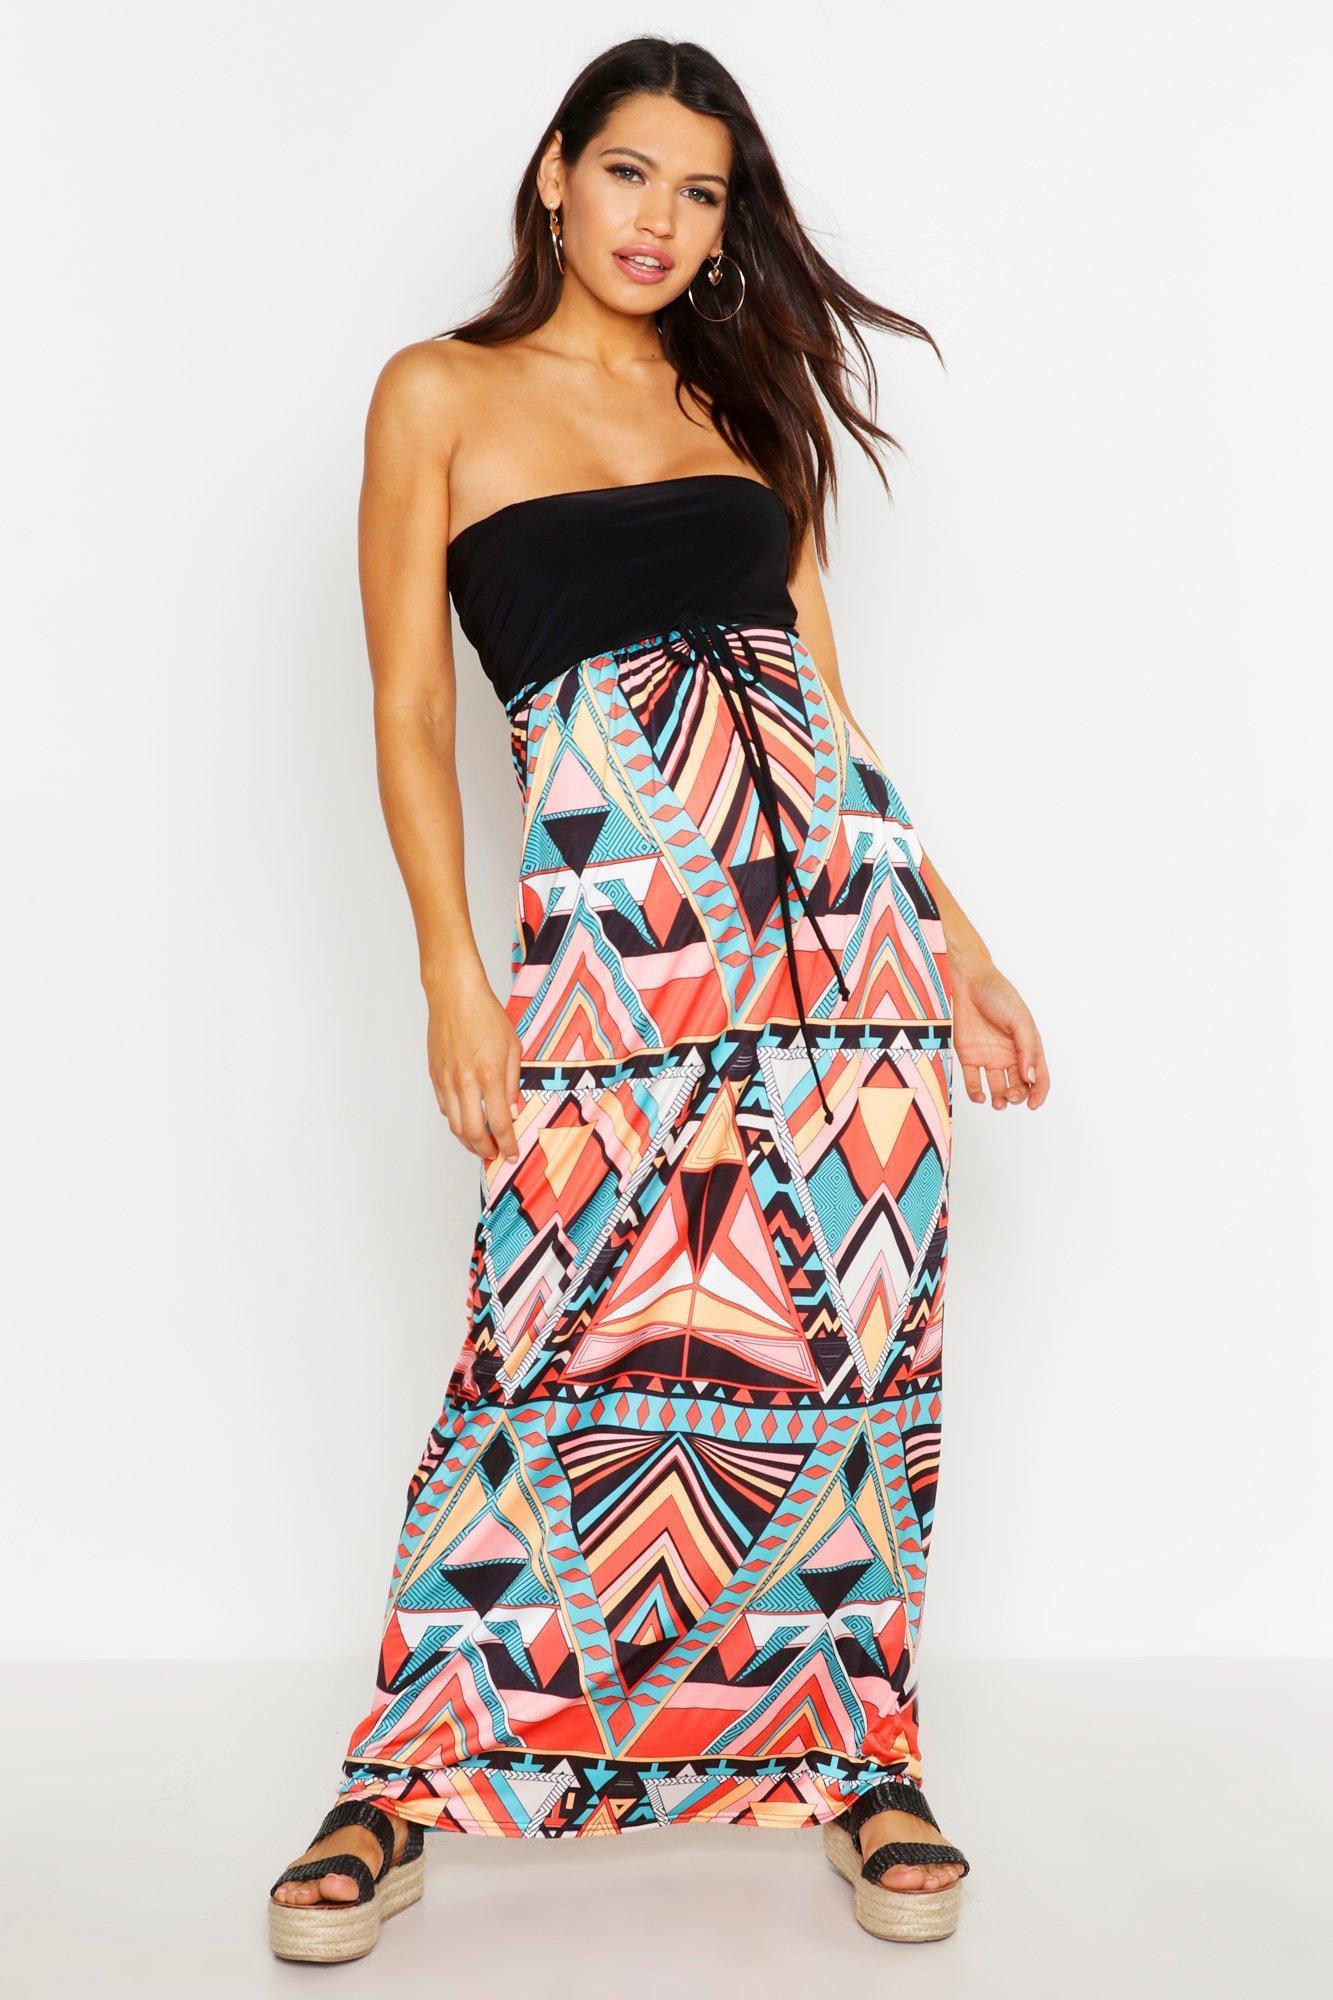 815be02c40cd1 Boohoo - Multicolor Maternity Aztec Bandeau Maxi Dress - Lyst. View  fullscreen